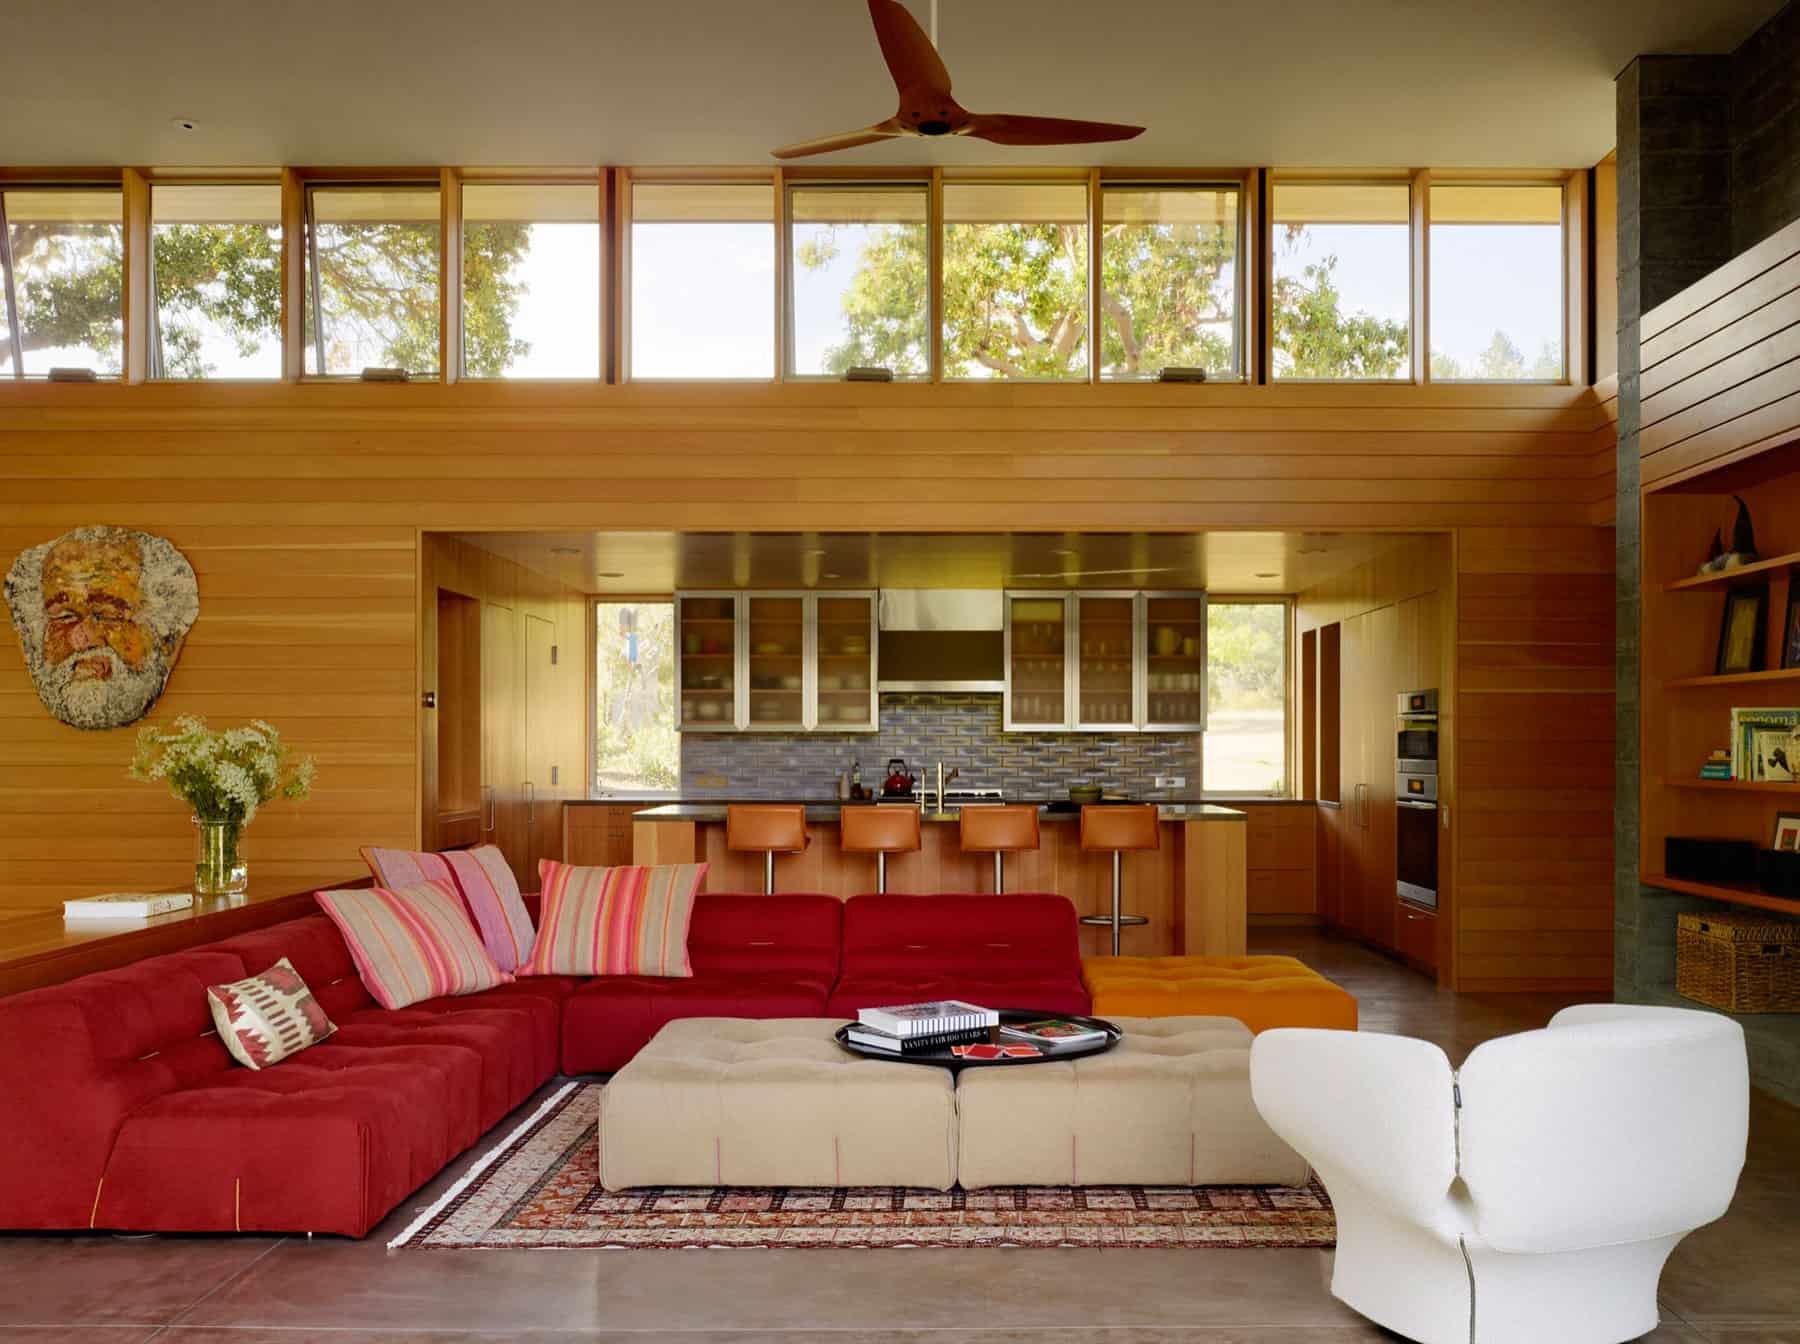 Turnbull Griffin Haesloop Architects Design a Net-Zero Home in Sonoma, California